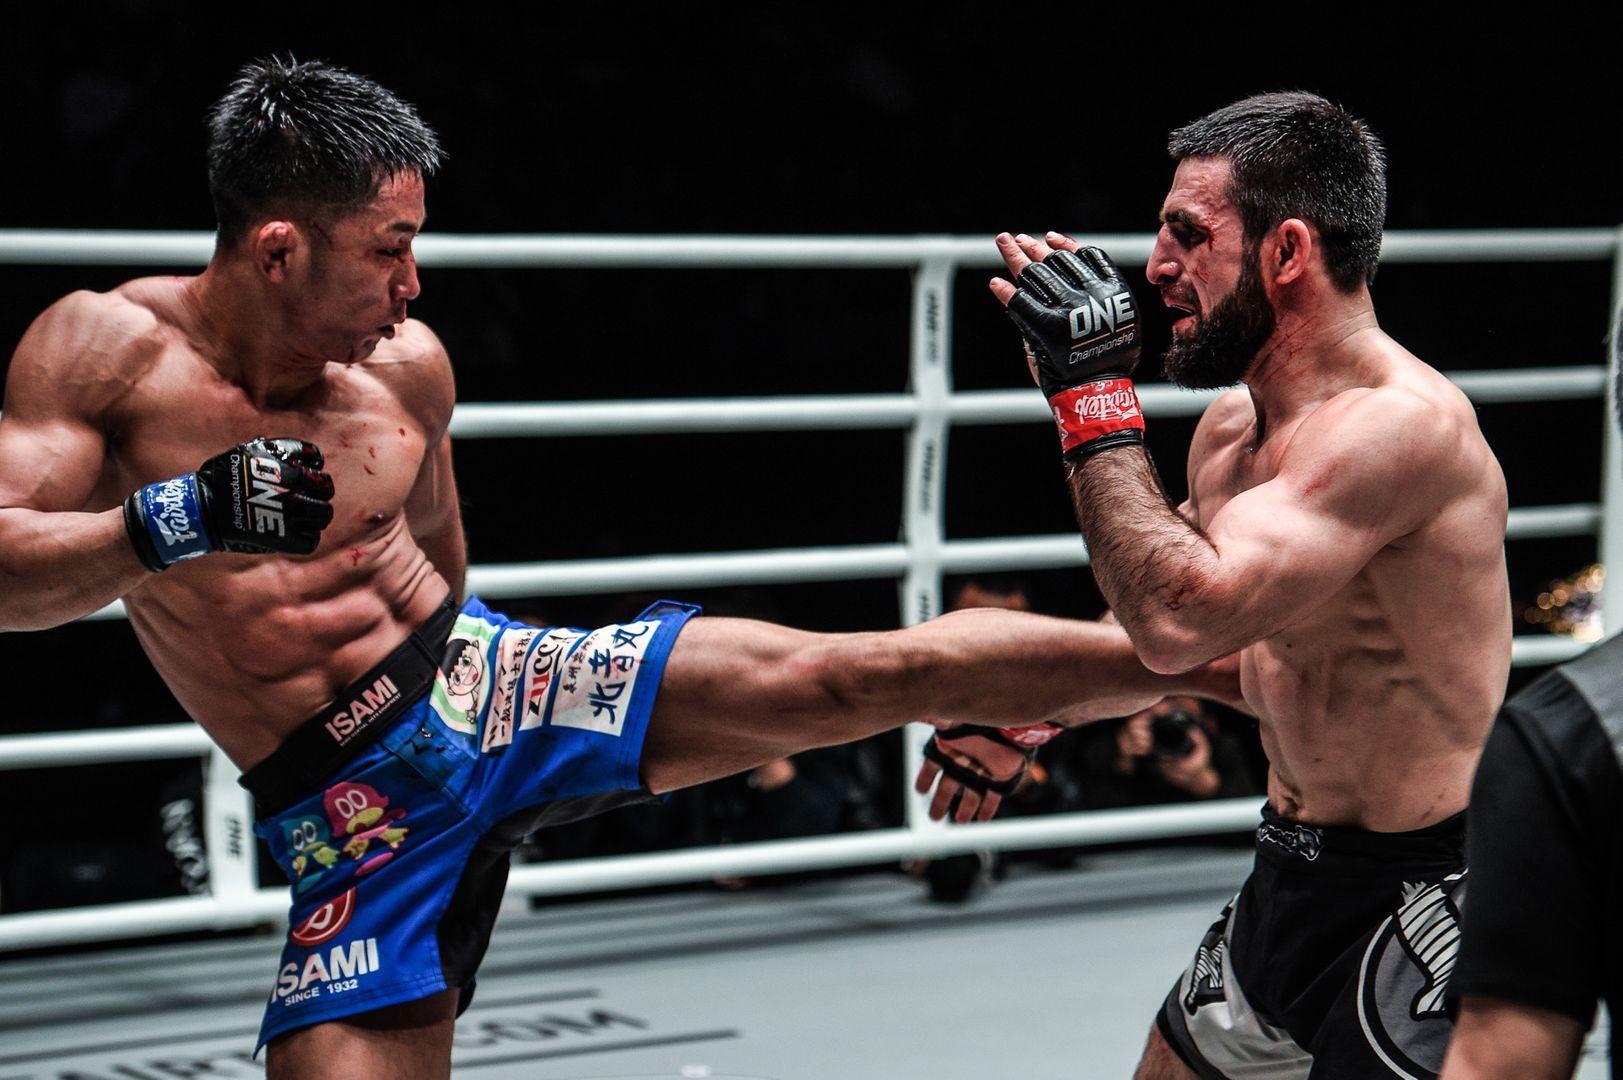 Daichi Takenaka throws a kick as Yusup Saadulaev